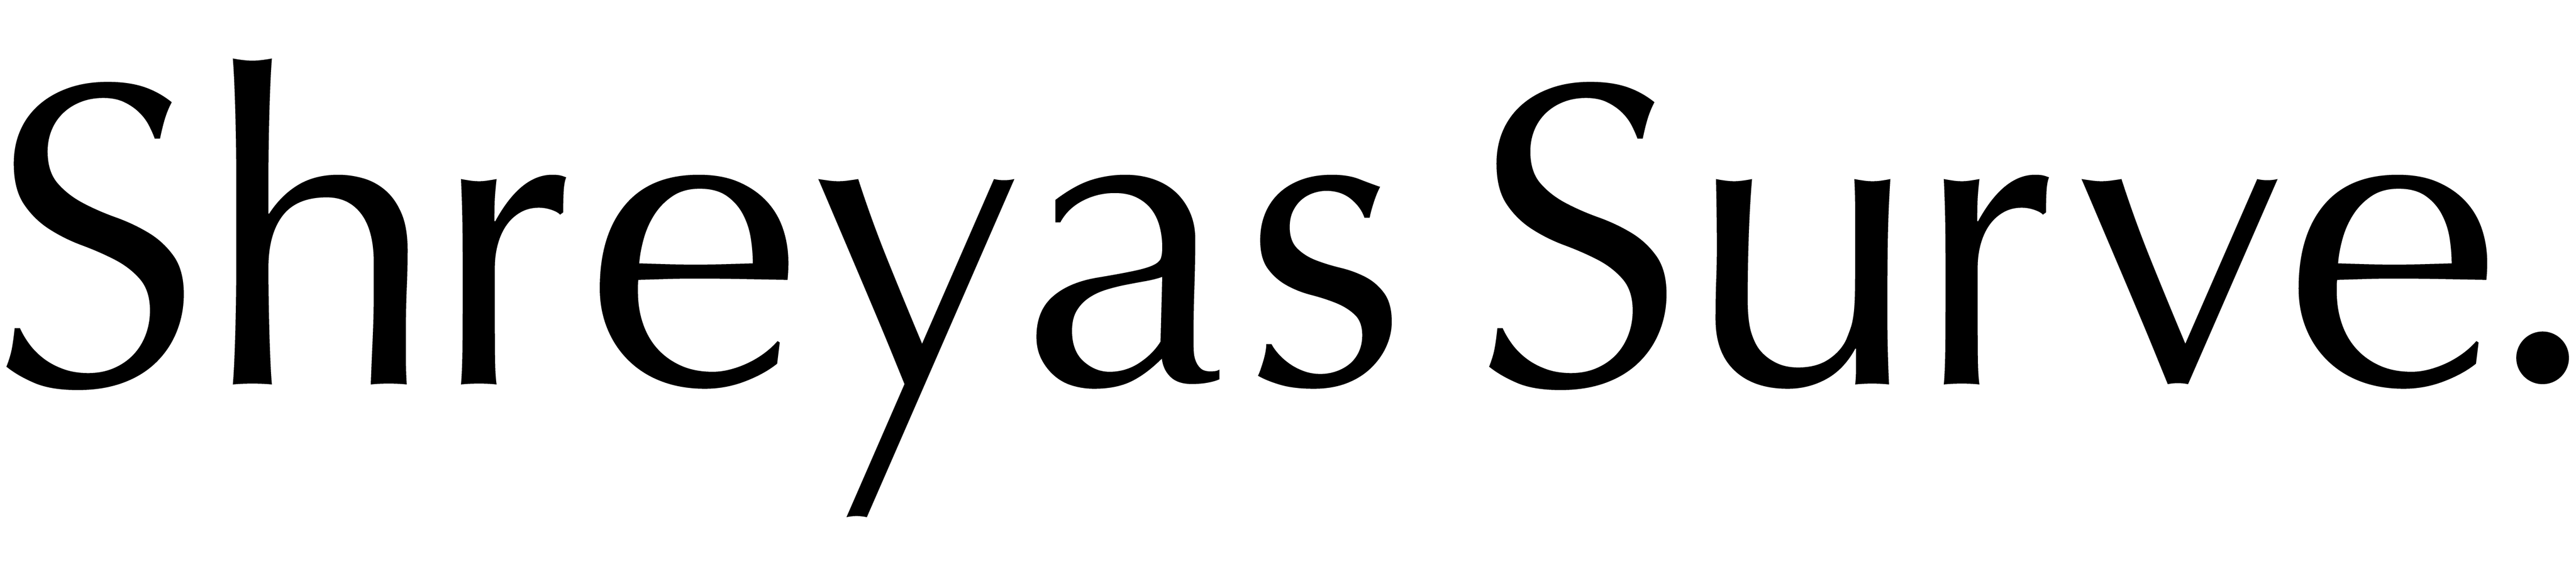 SHREYAS SURVE